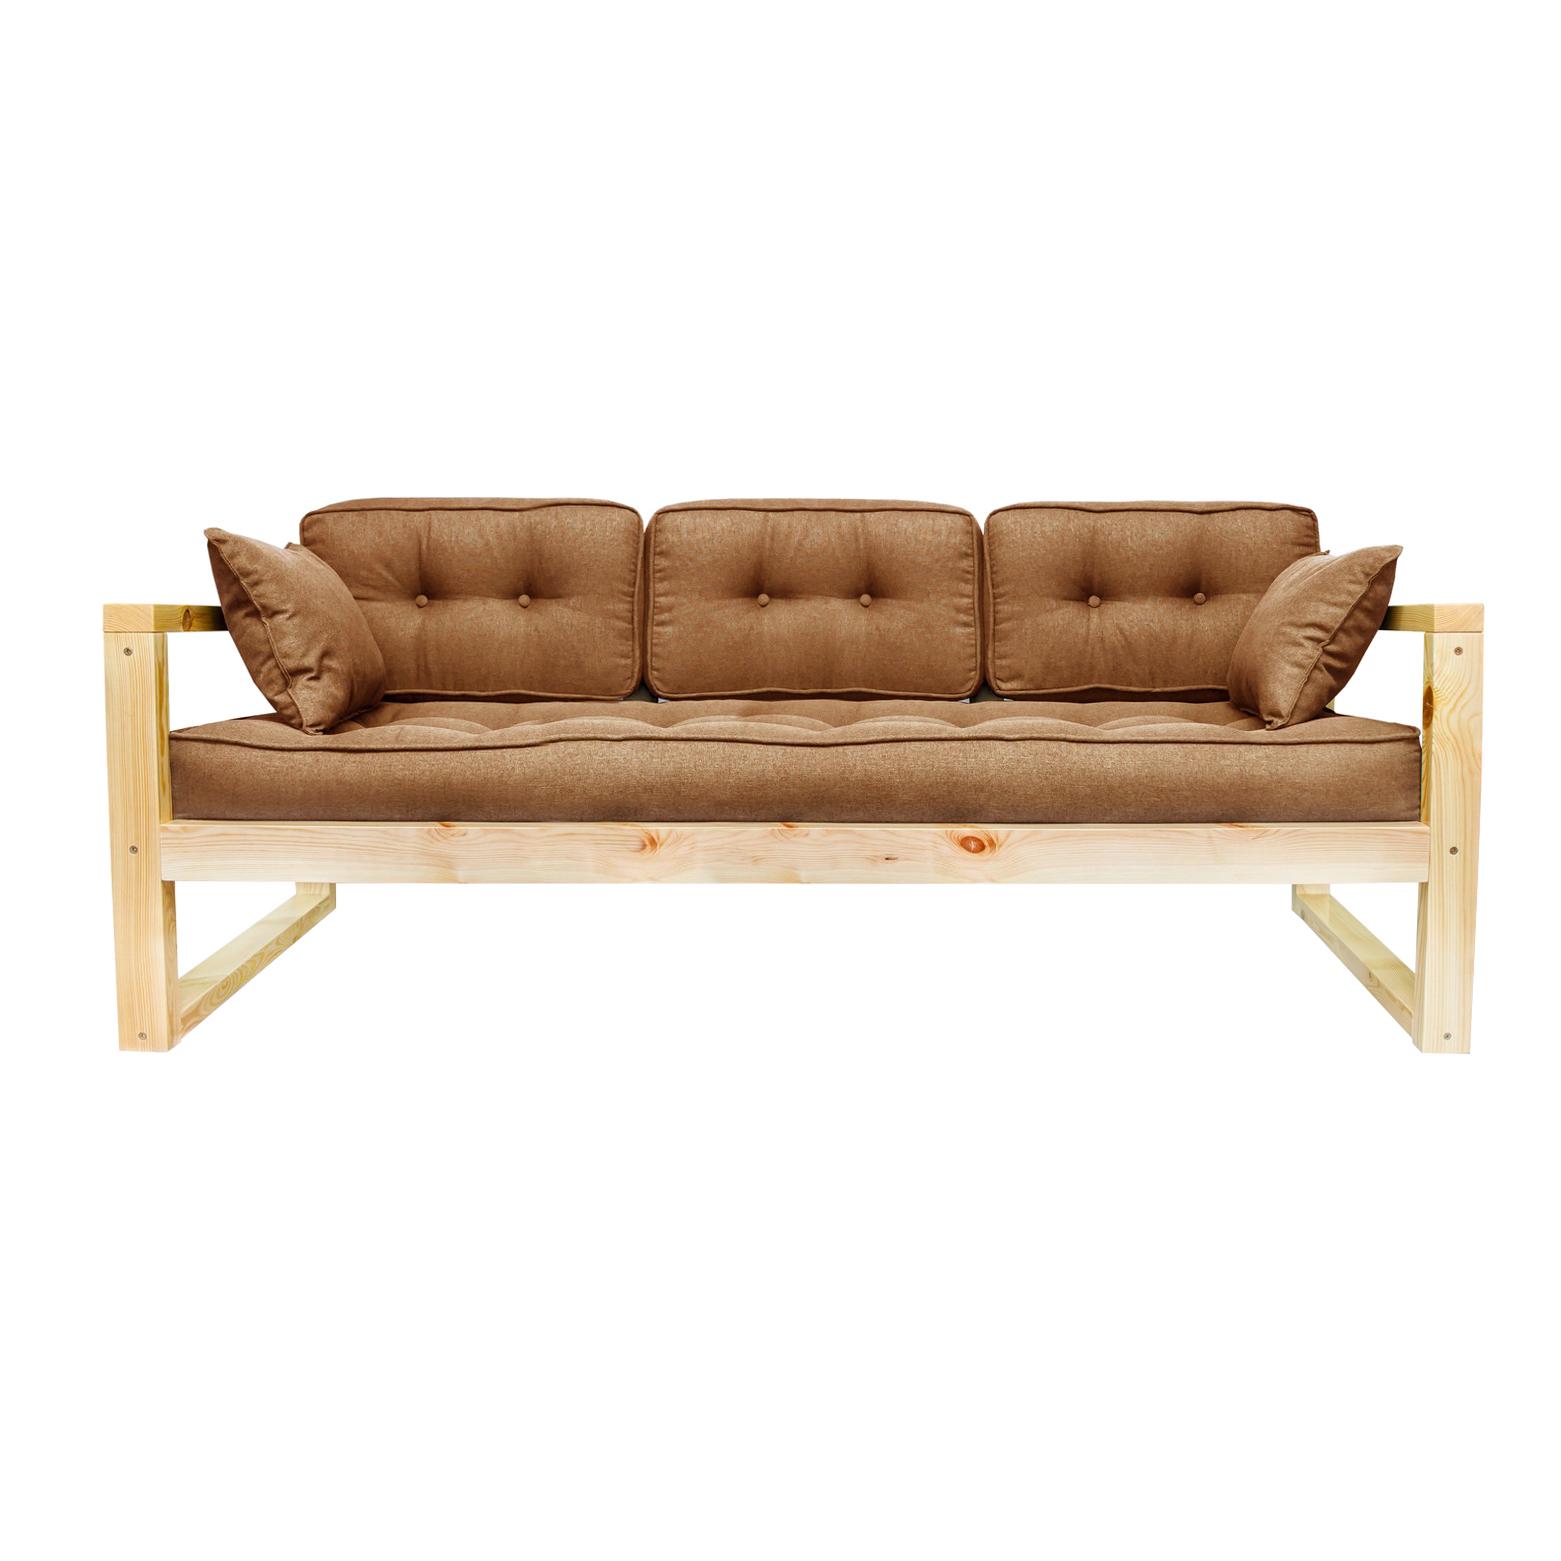 Фото - Диван AS Алекс б 178x73x64 сосна/коричневый диван as алекс б 178x73x64 белый графитовый